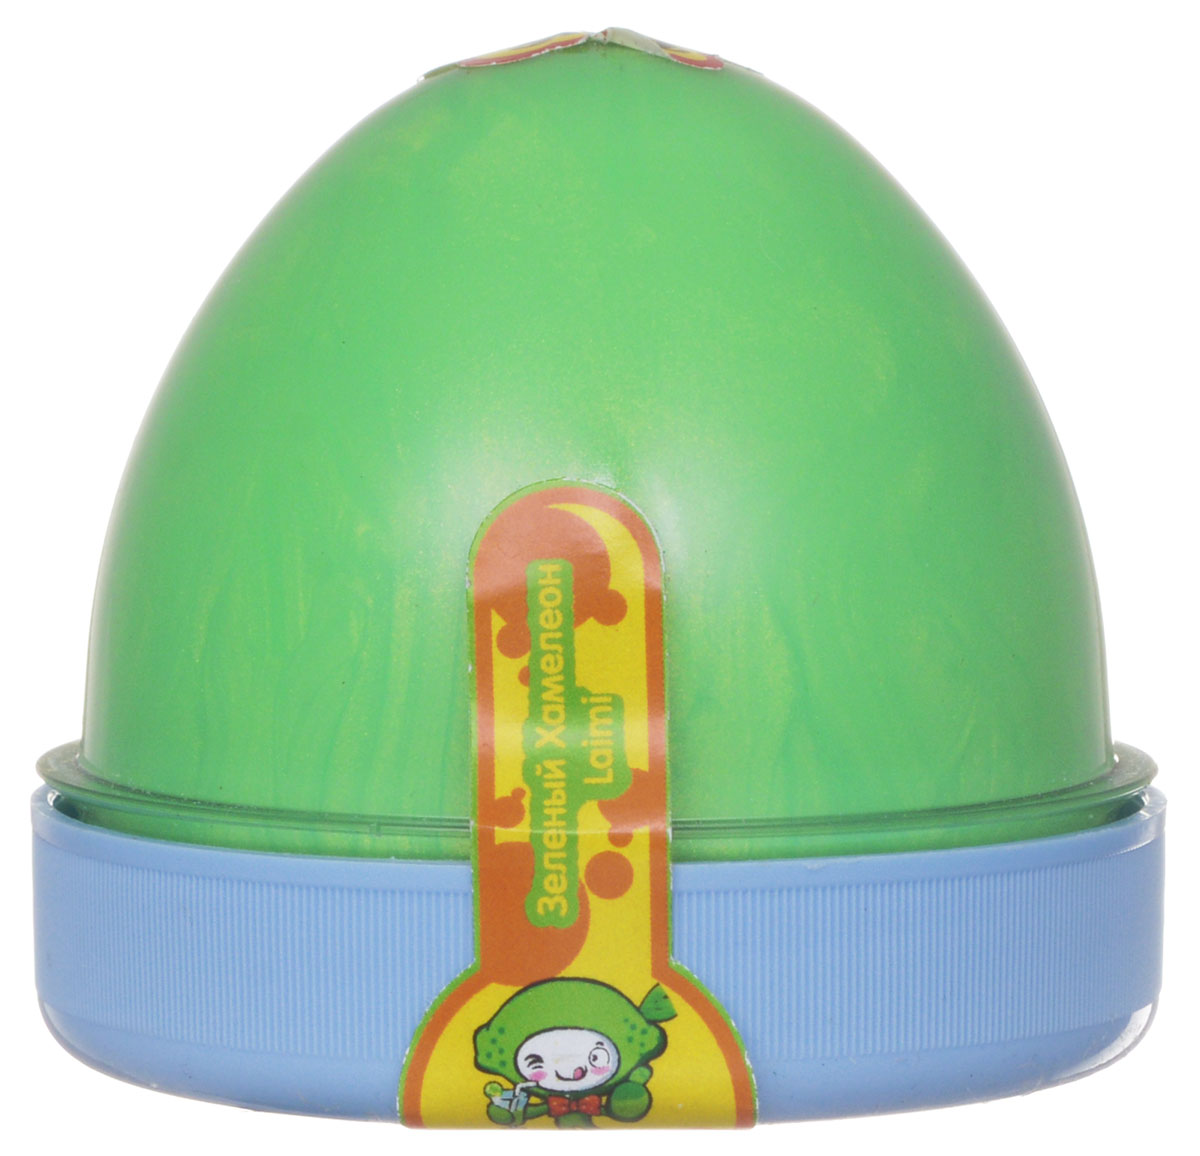 "Жвачка для рук ""ТМ HandGum"", цвет: зеленый хамелеон, с запахом лайма, 70 г"